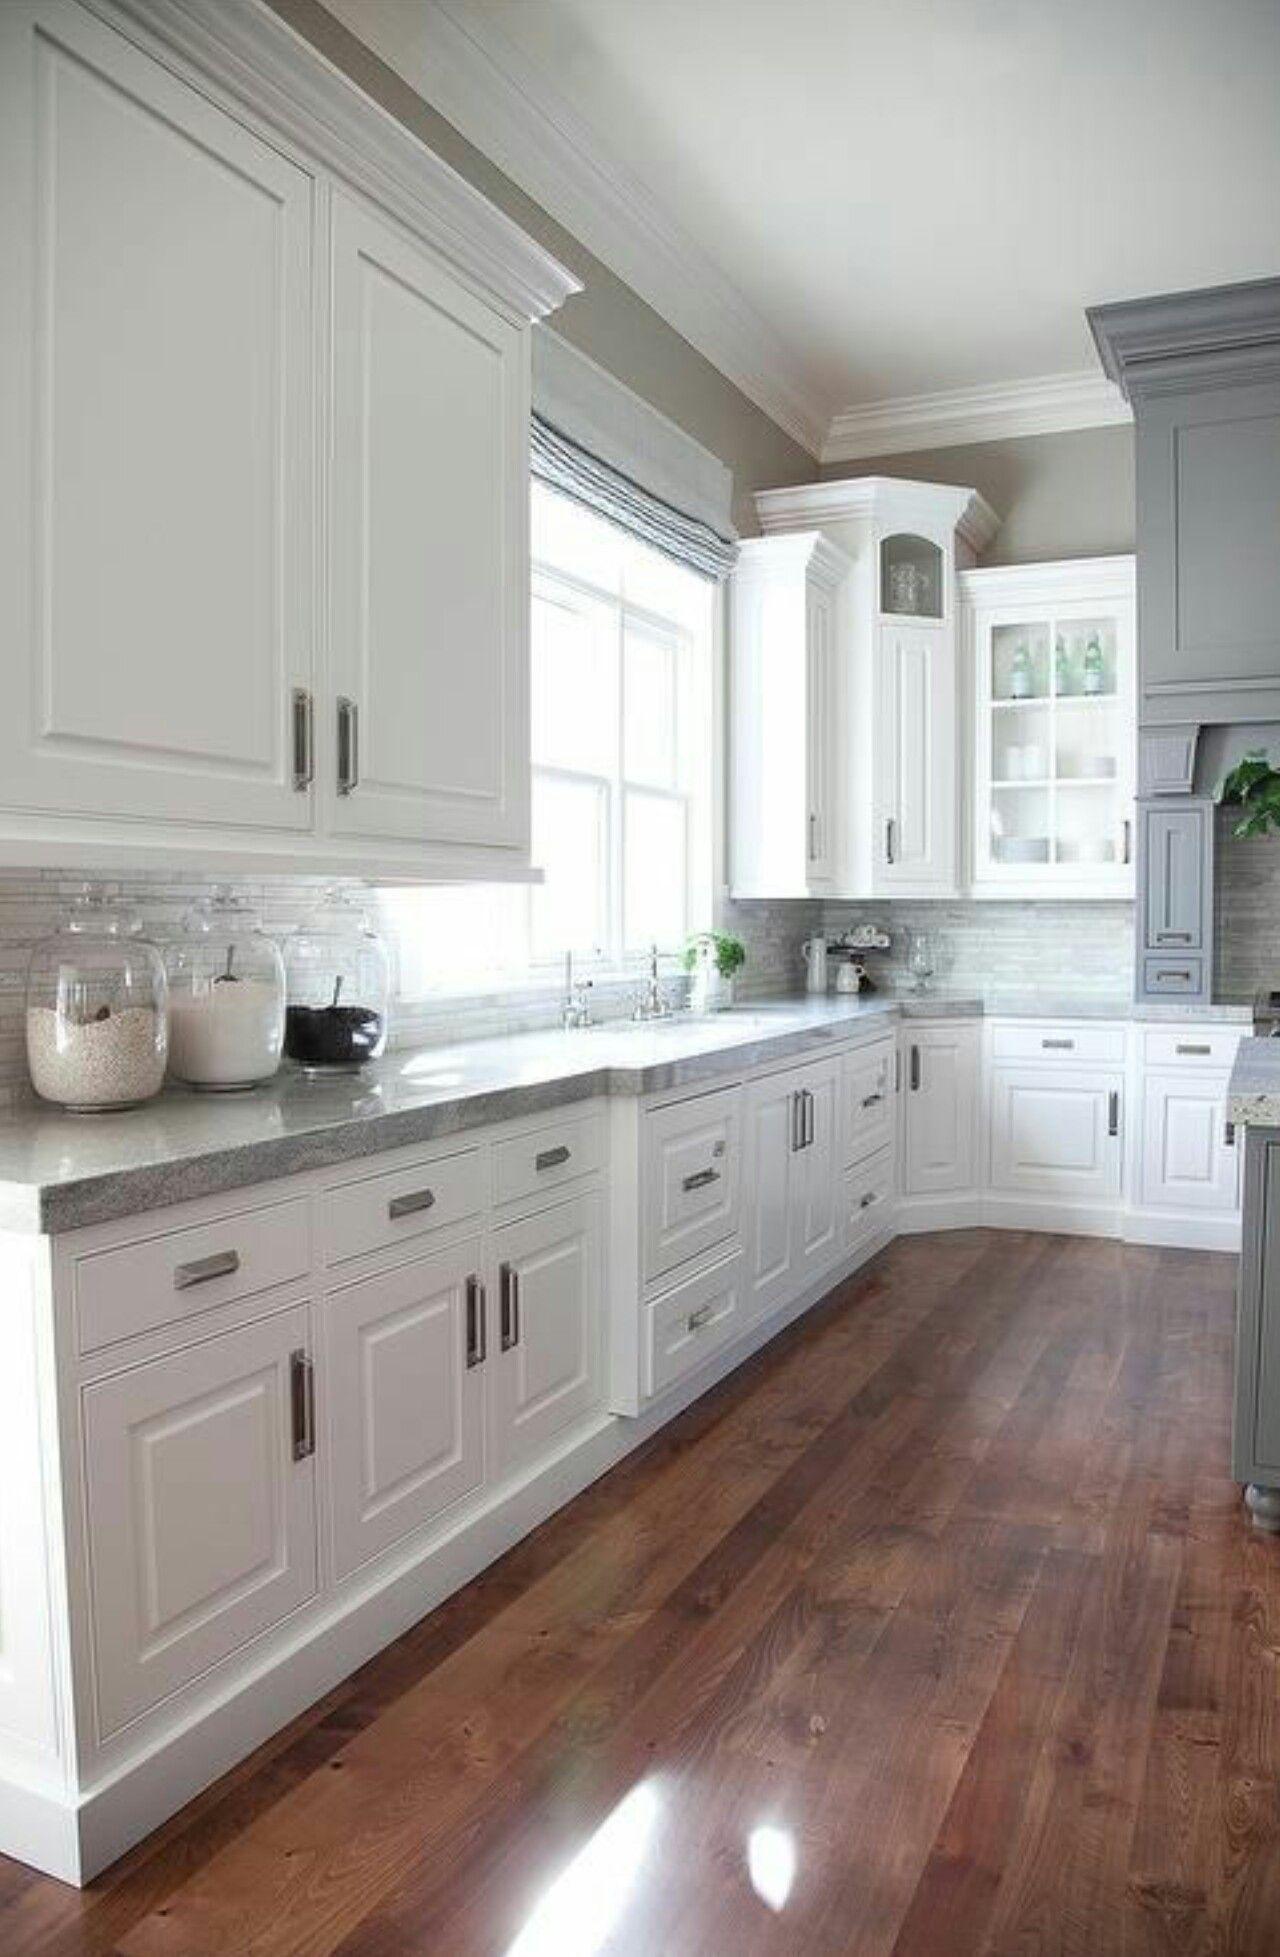 White Cabinets Grey Counter Tops Light Grey Back Splash Soft